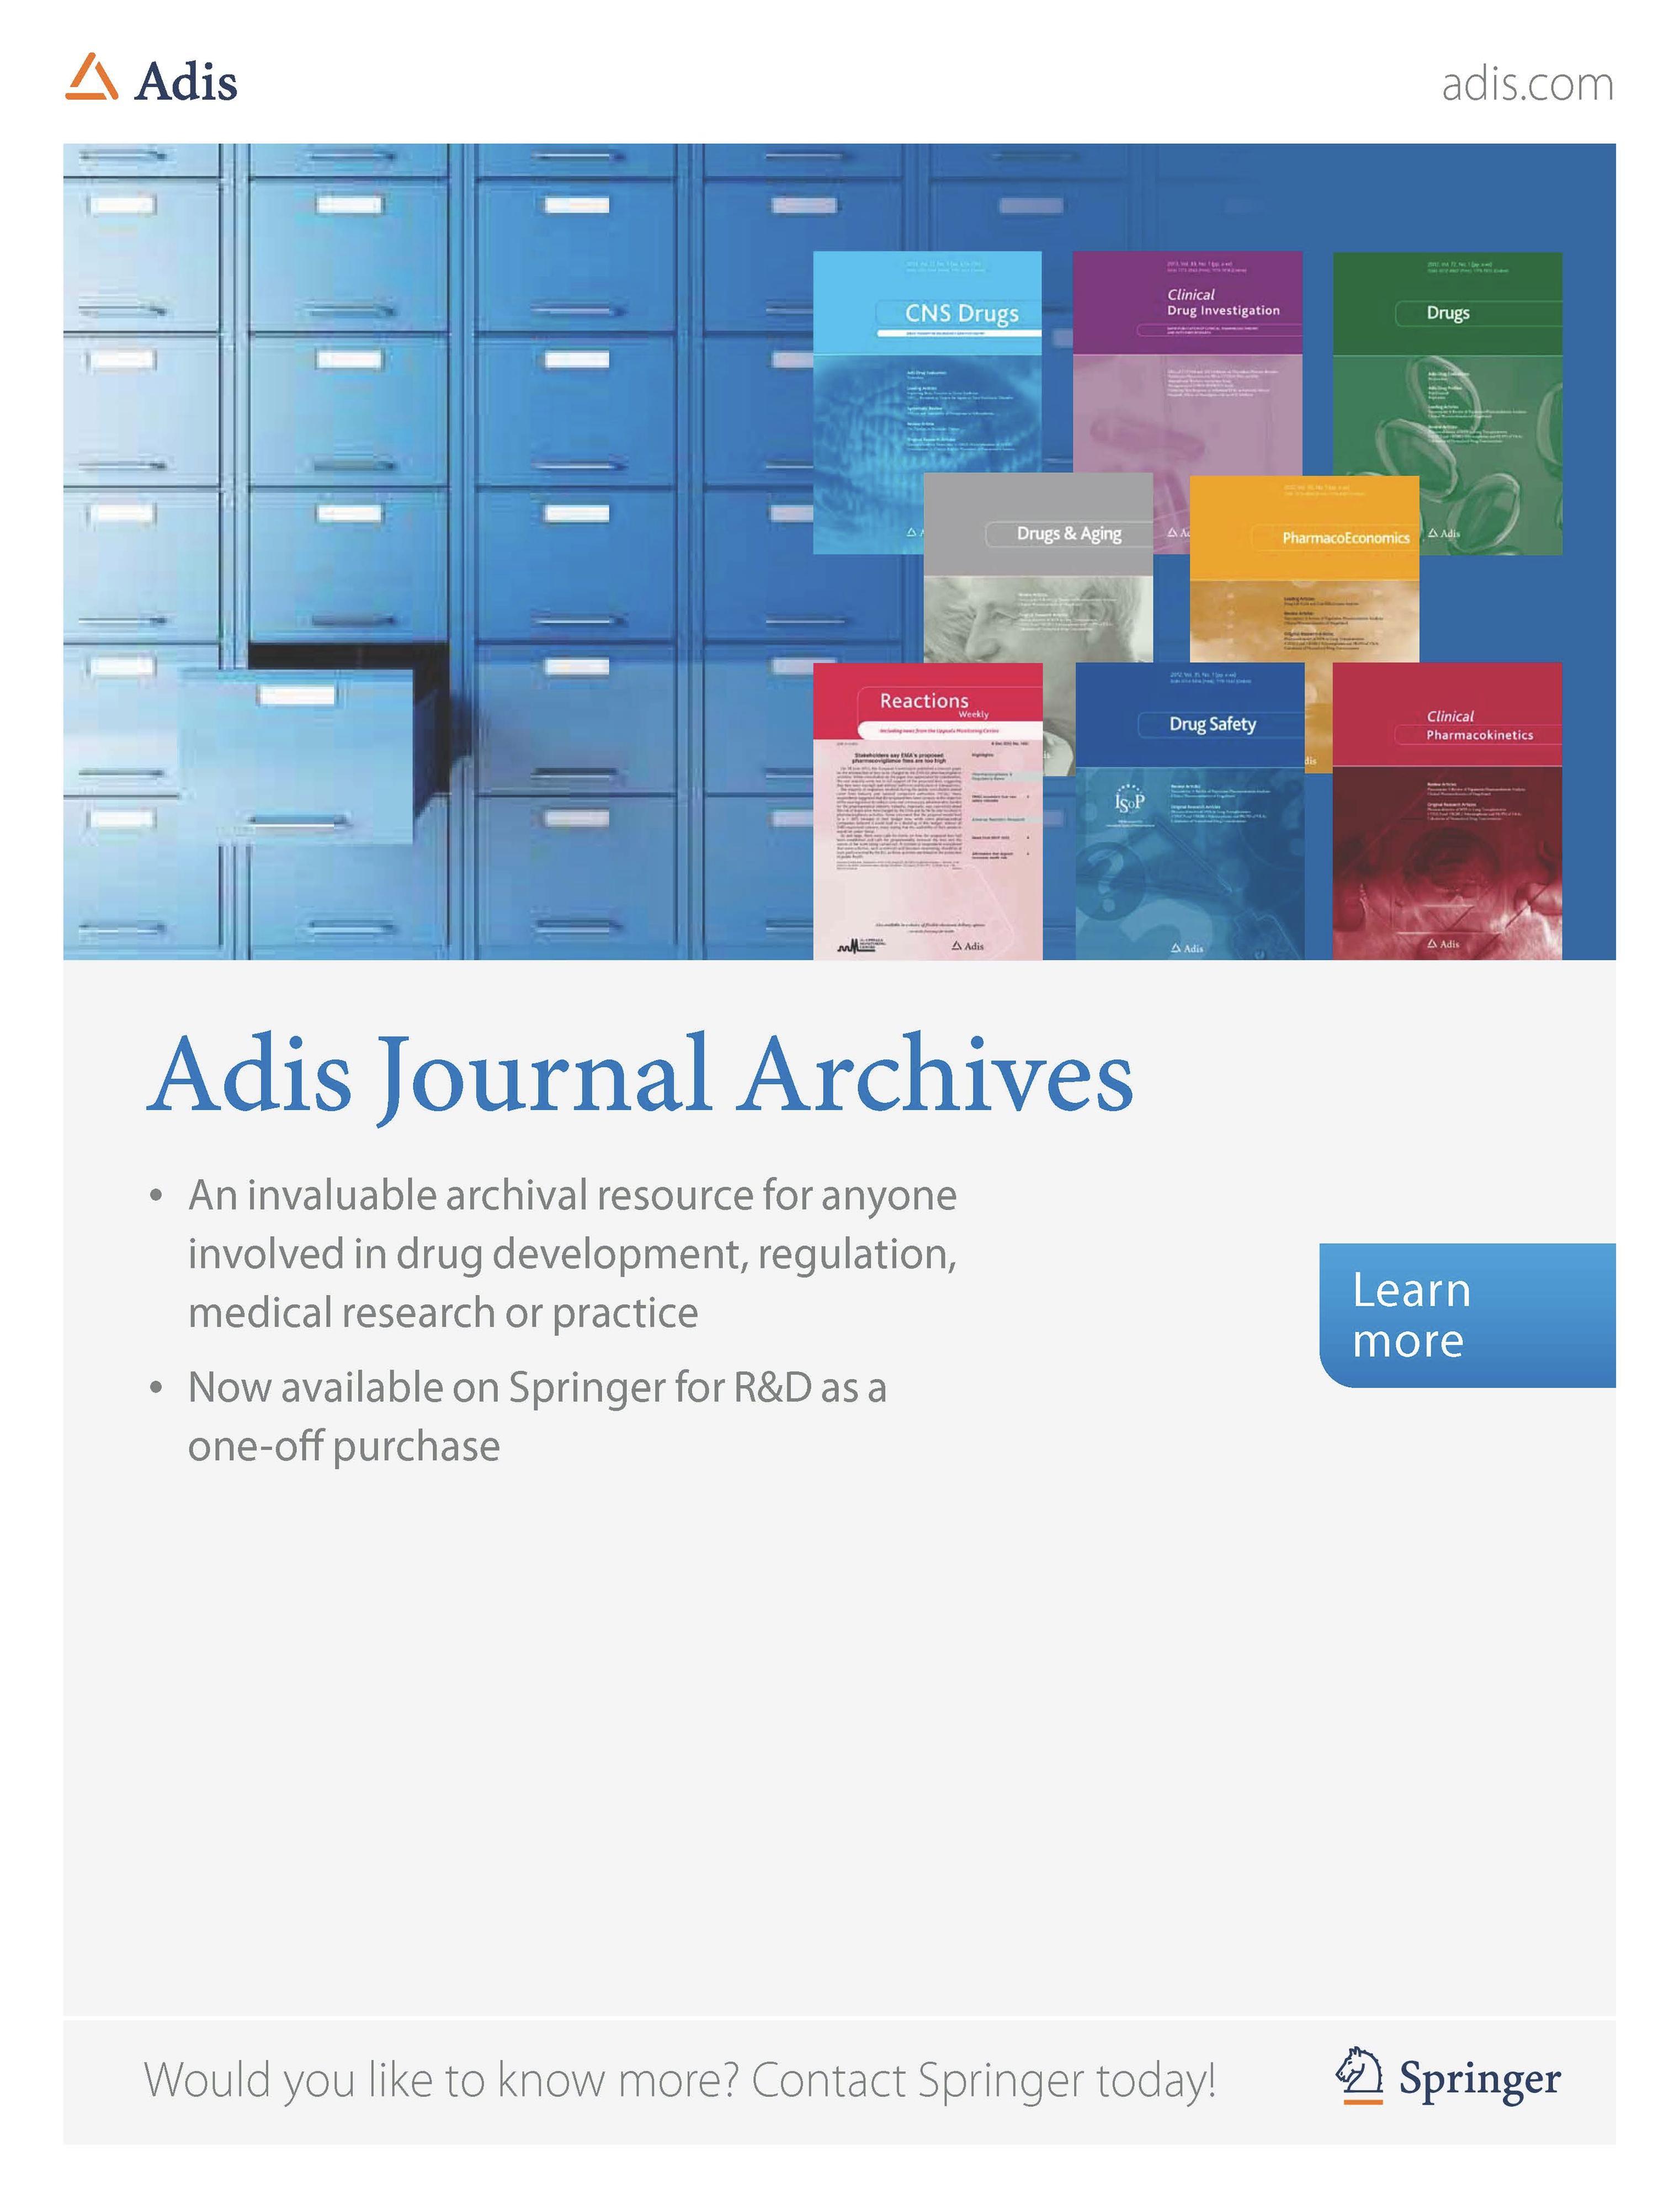 Adis journal archives